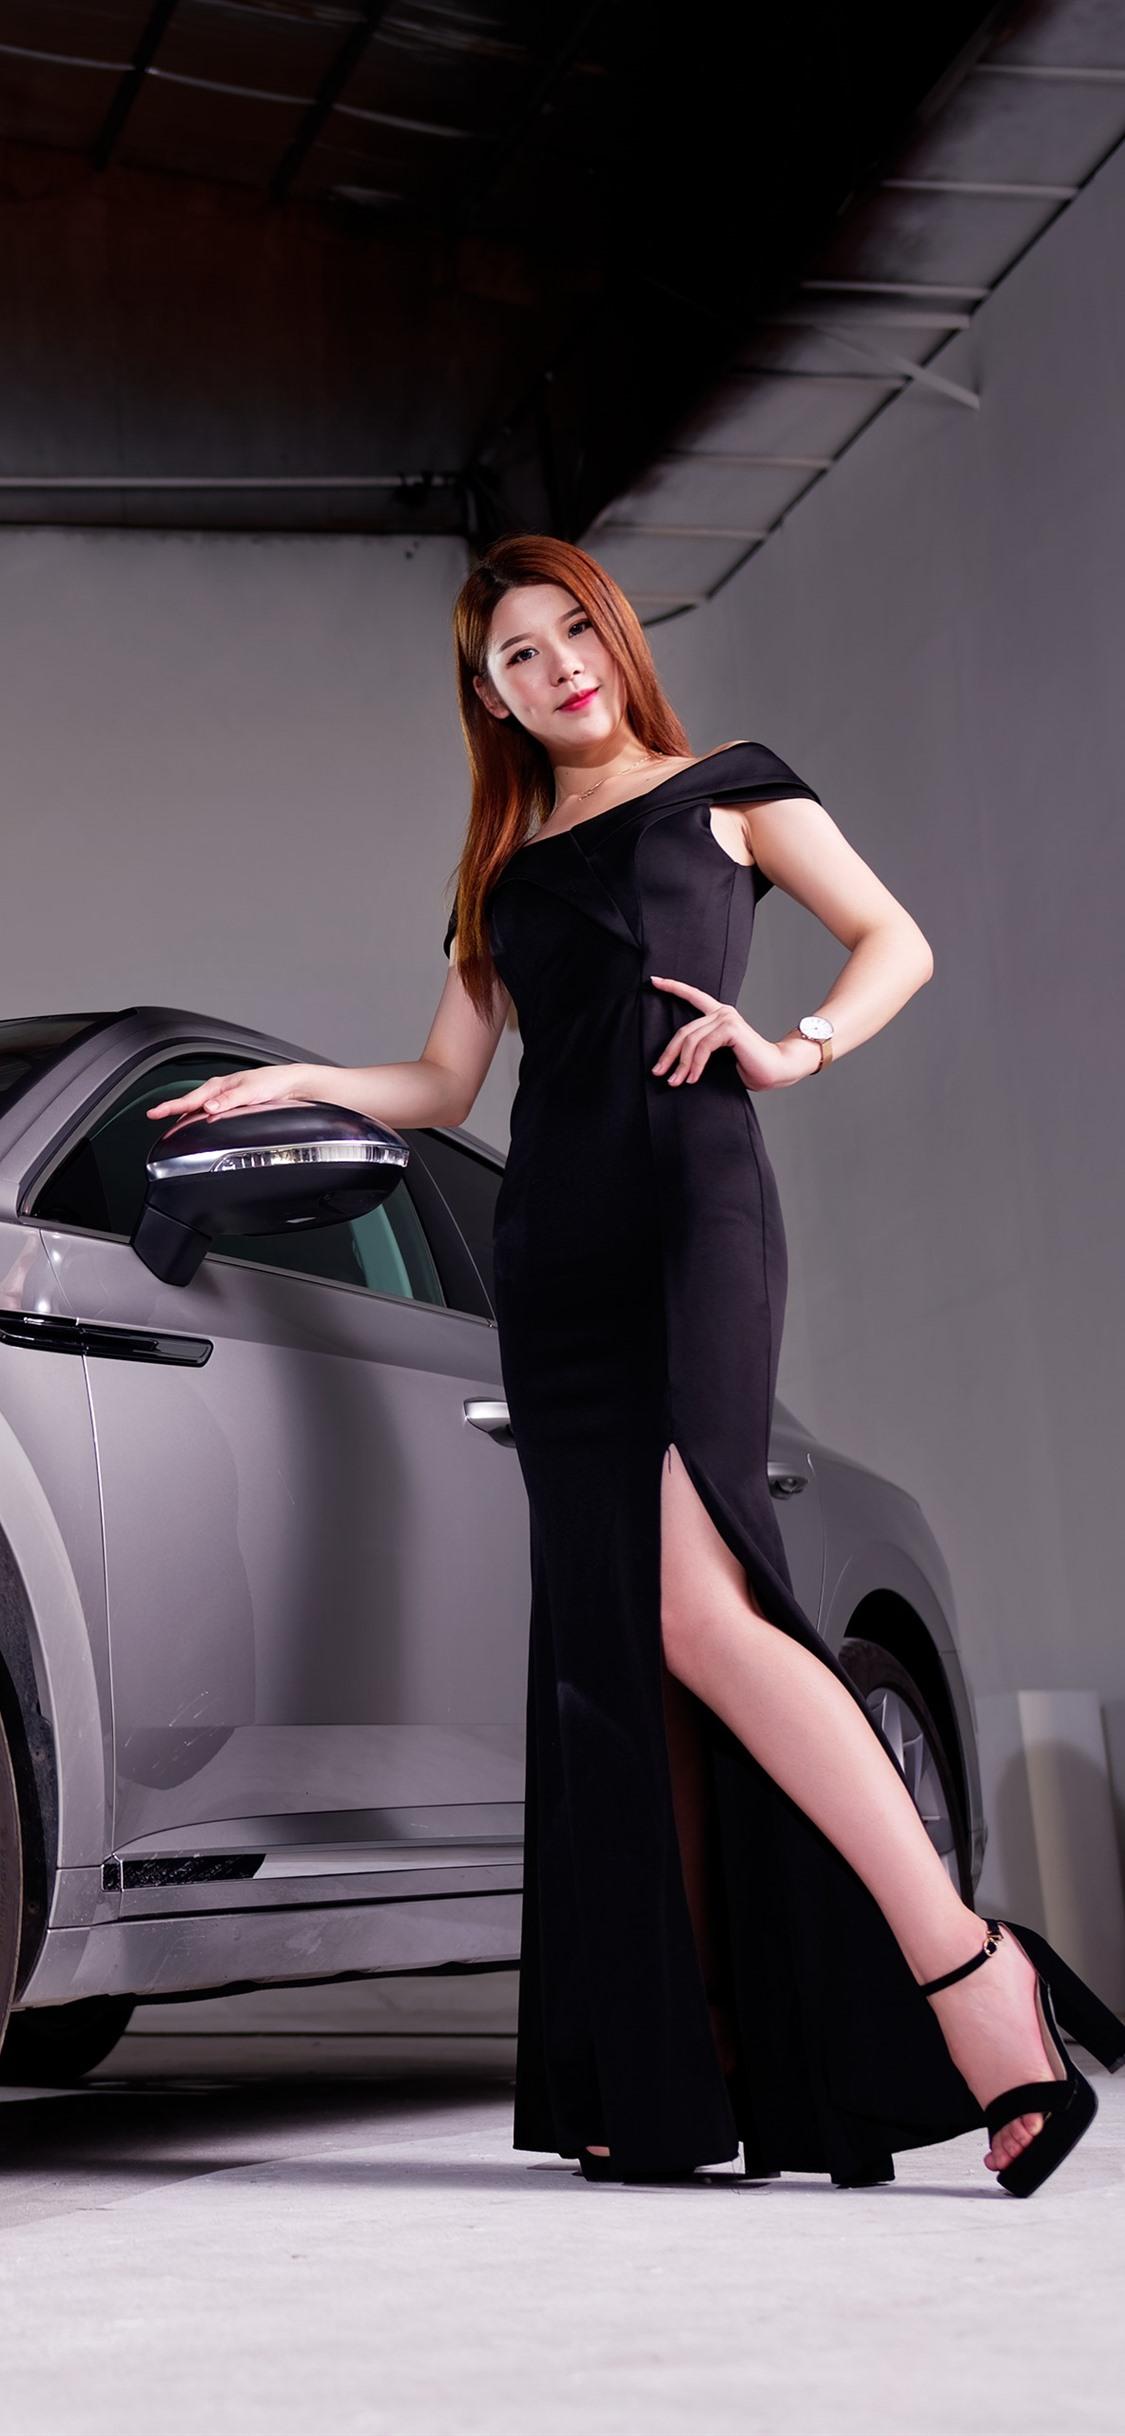 Volkswagen silver car, black skirt girl 1125x2436 iPhone XS